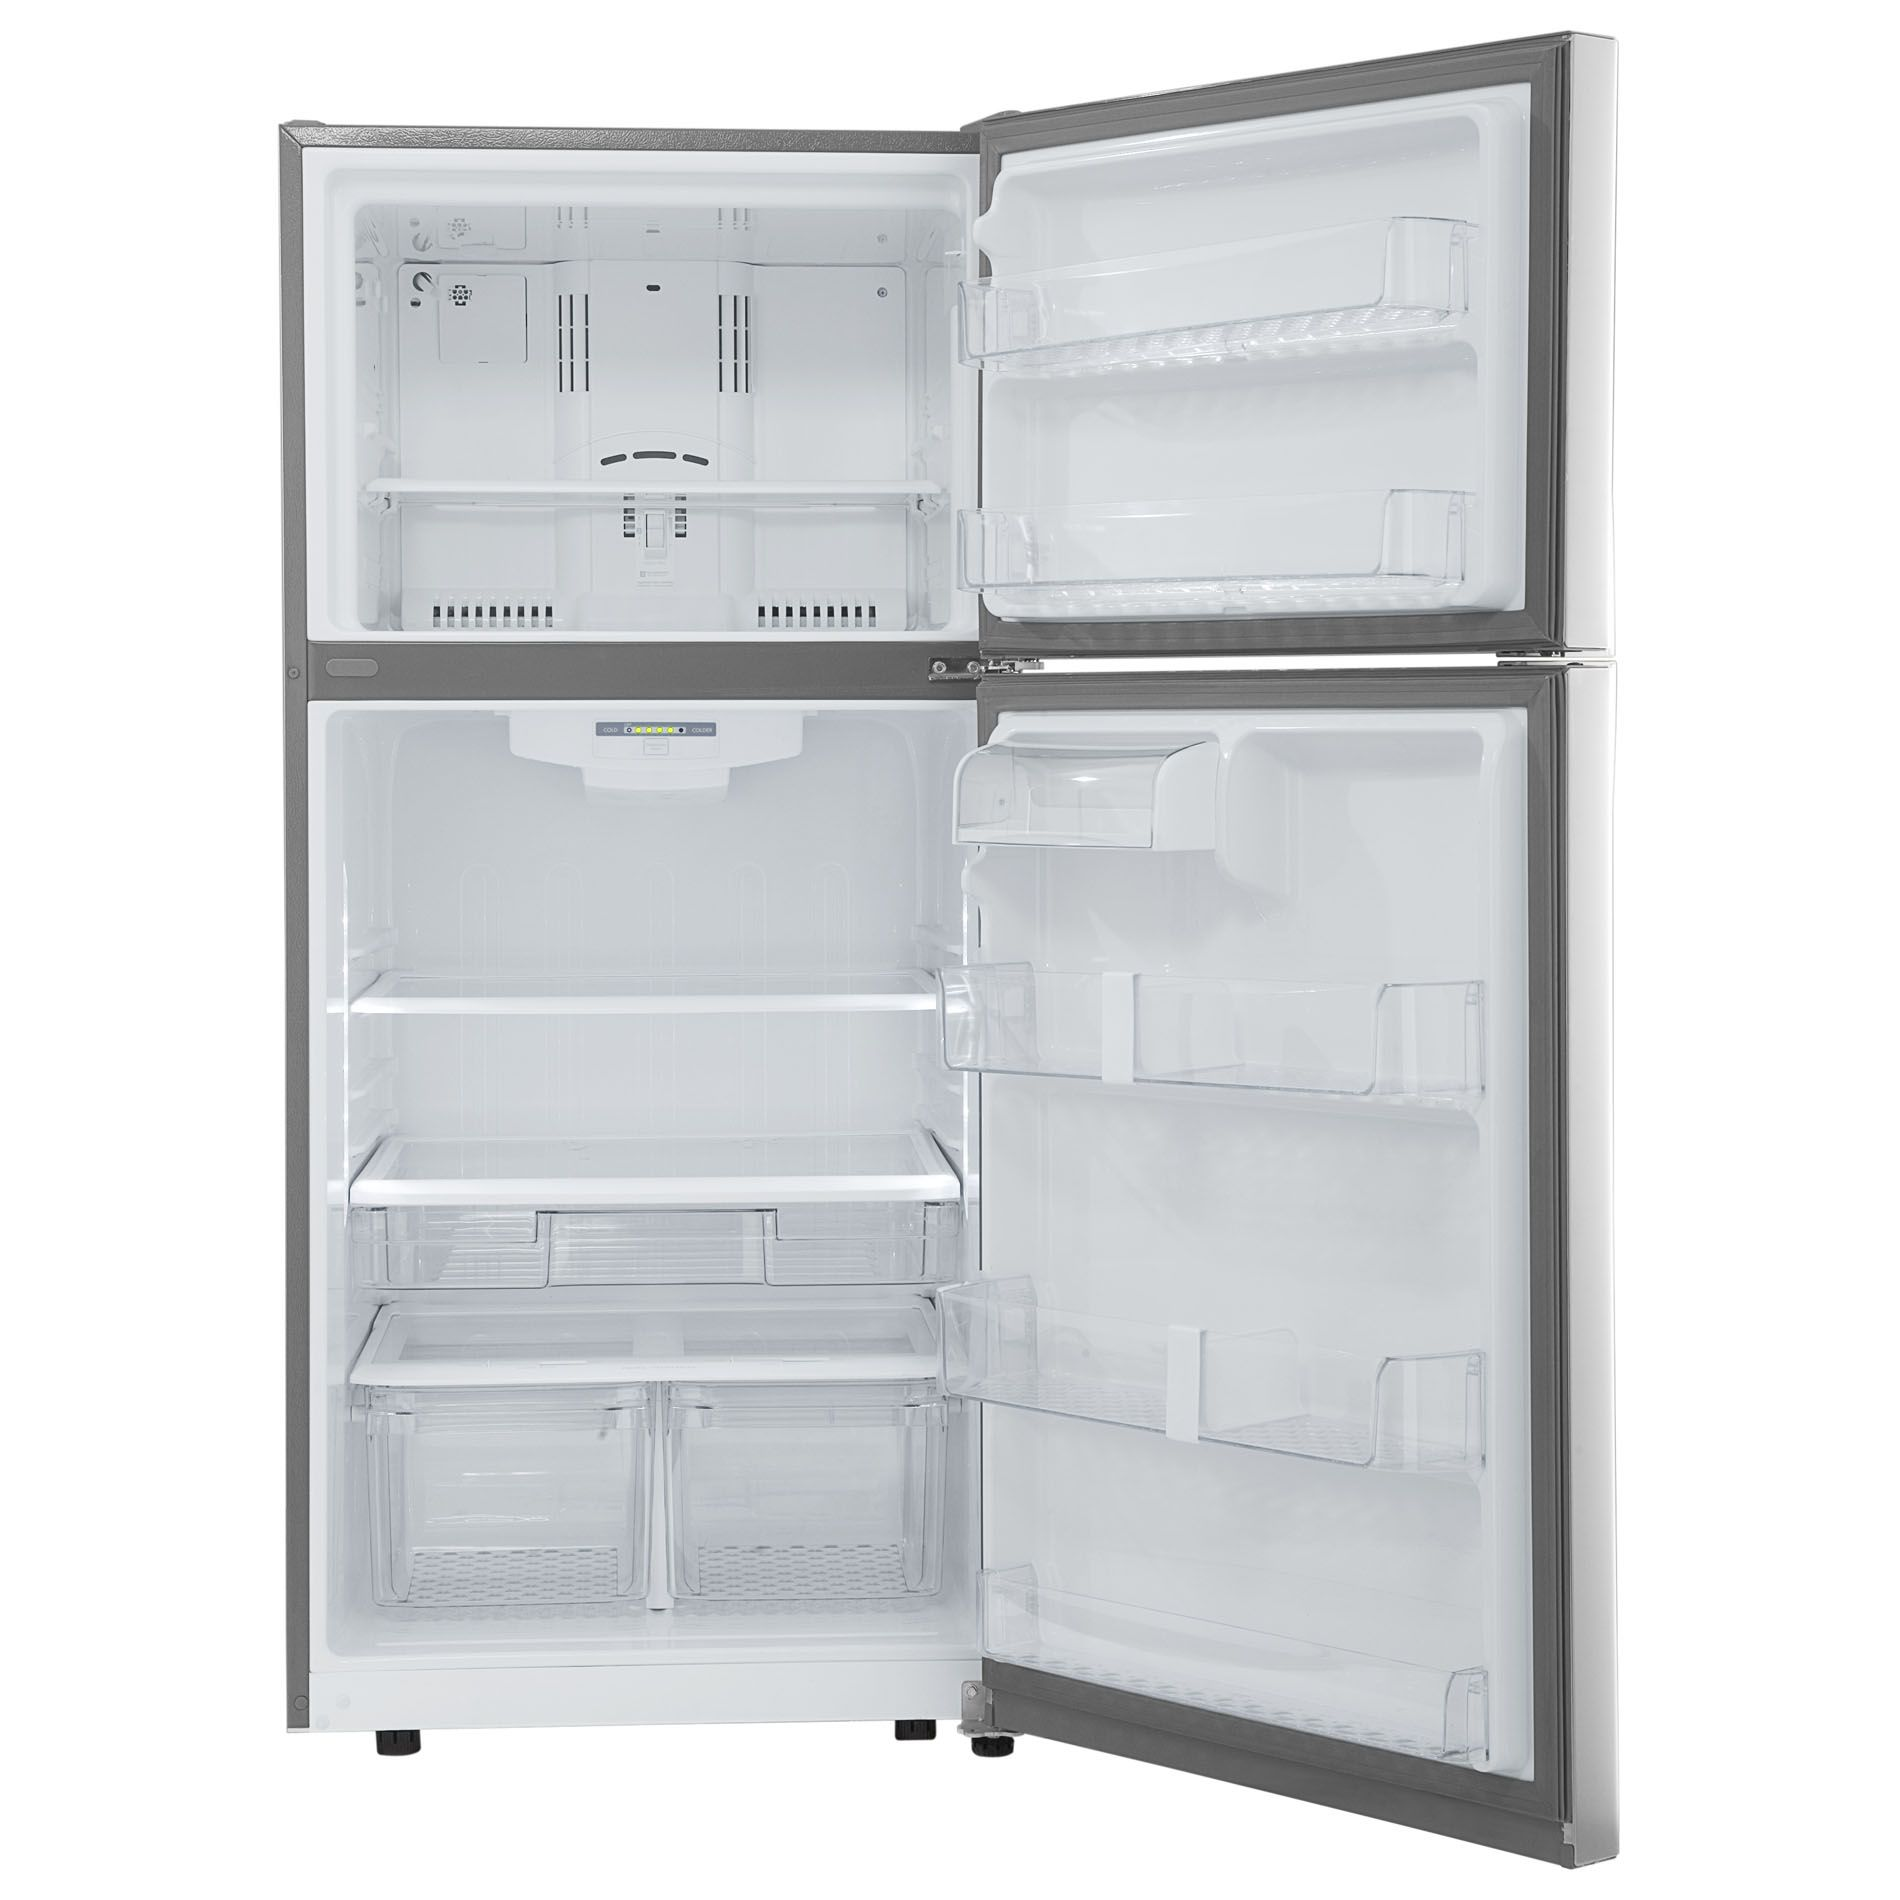 Kenmore 20 cu. ft. Stainless Steel Top-Freezer Refrigerator